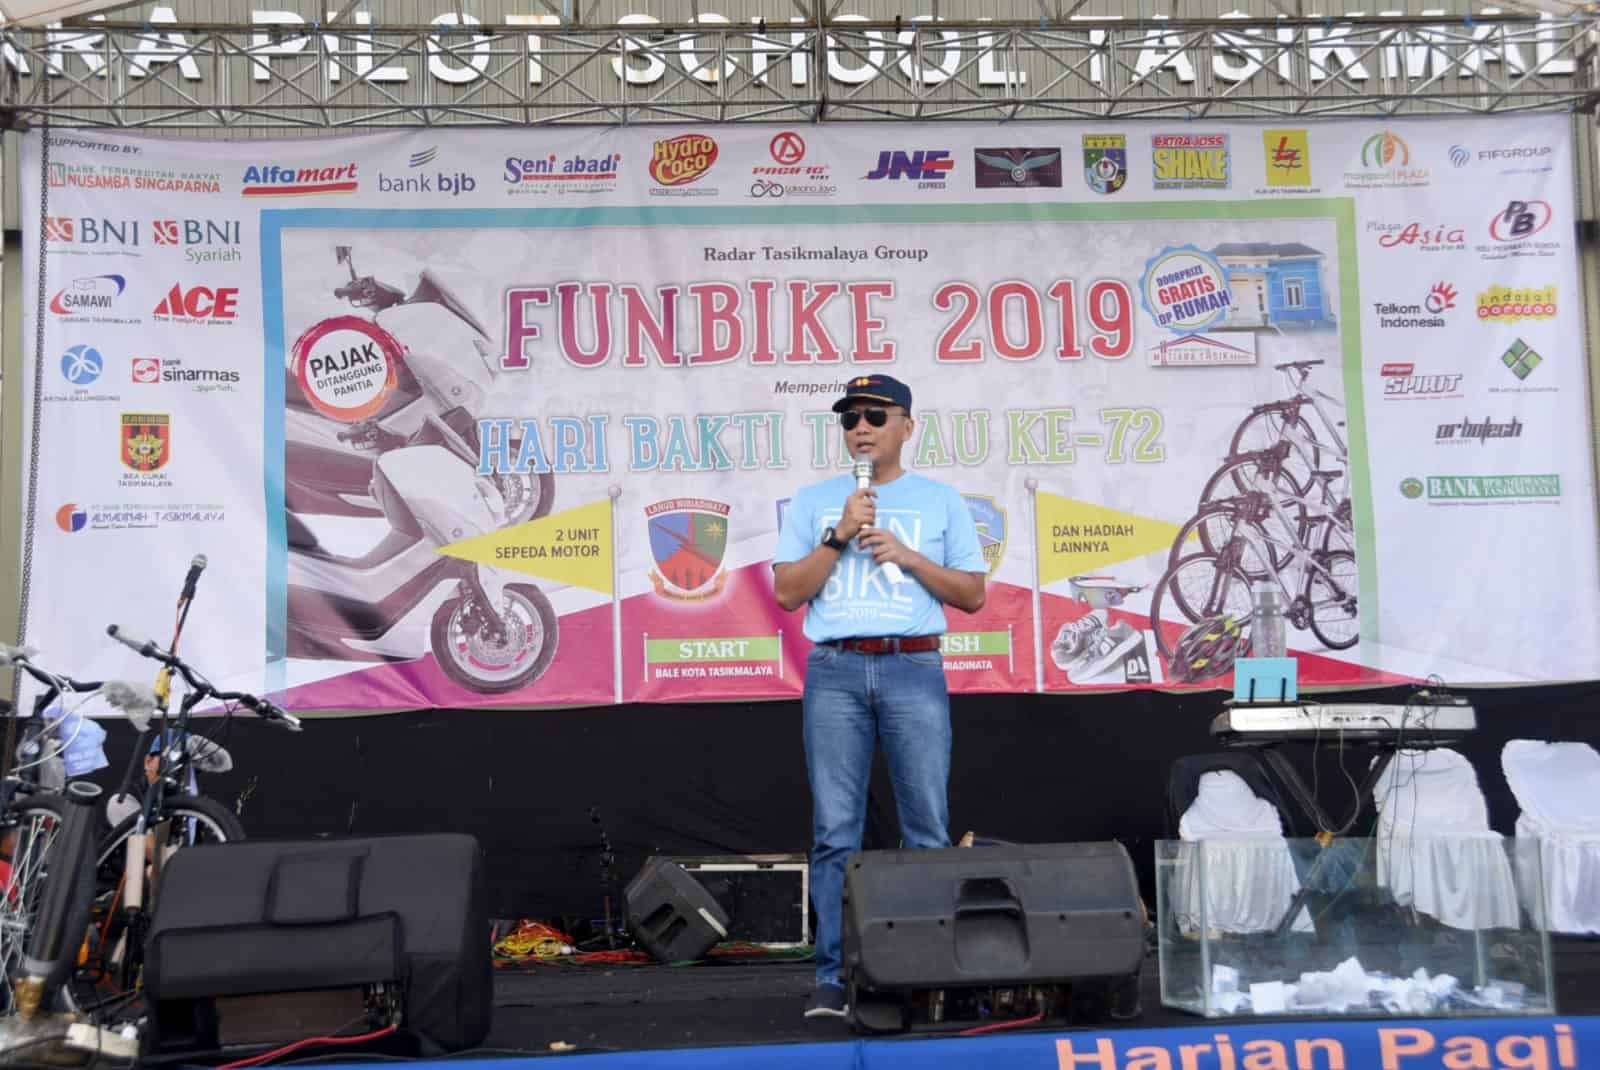 Lanud Wiriadinata Dan Radar Tasikmalaya Grup Gelar Fun Bike